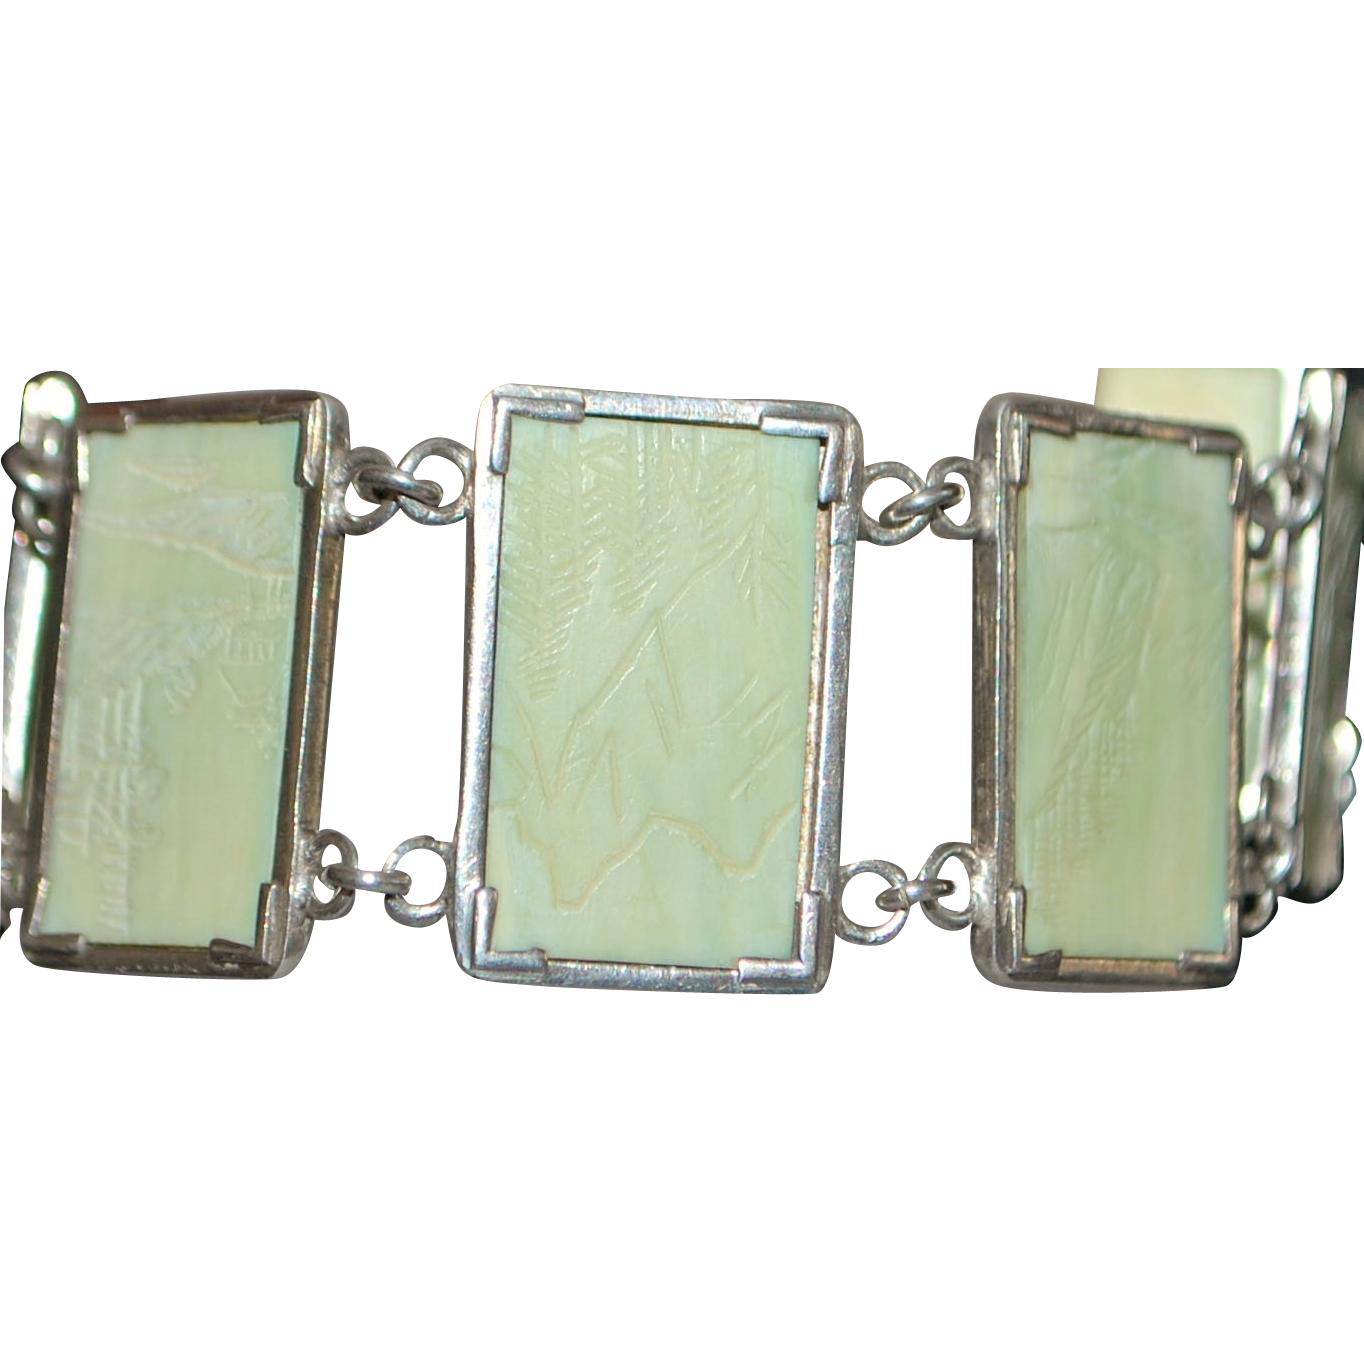 Vintage Kotobuki Silver and Bamboo Bracelet - 1950's